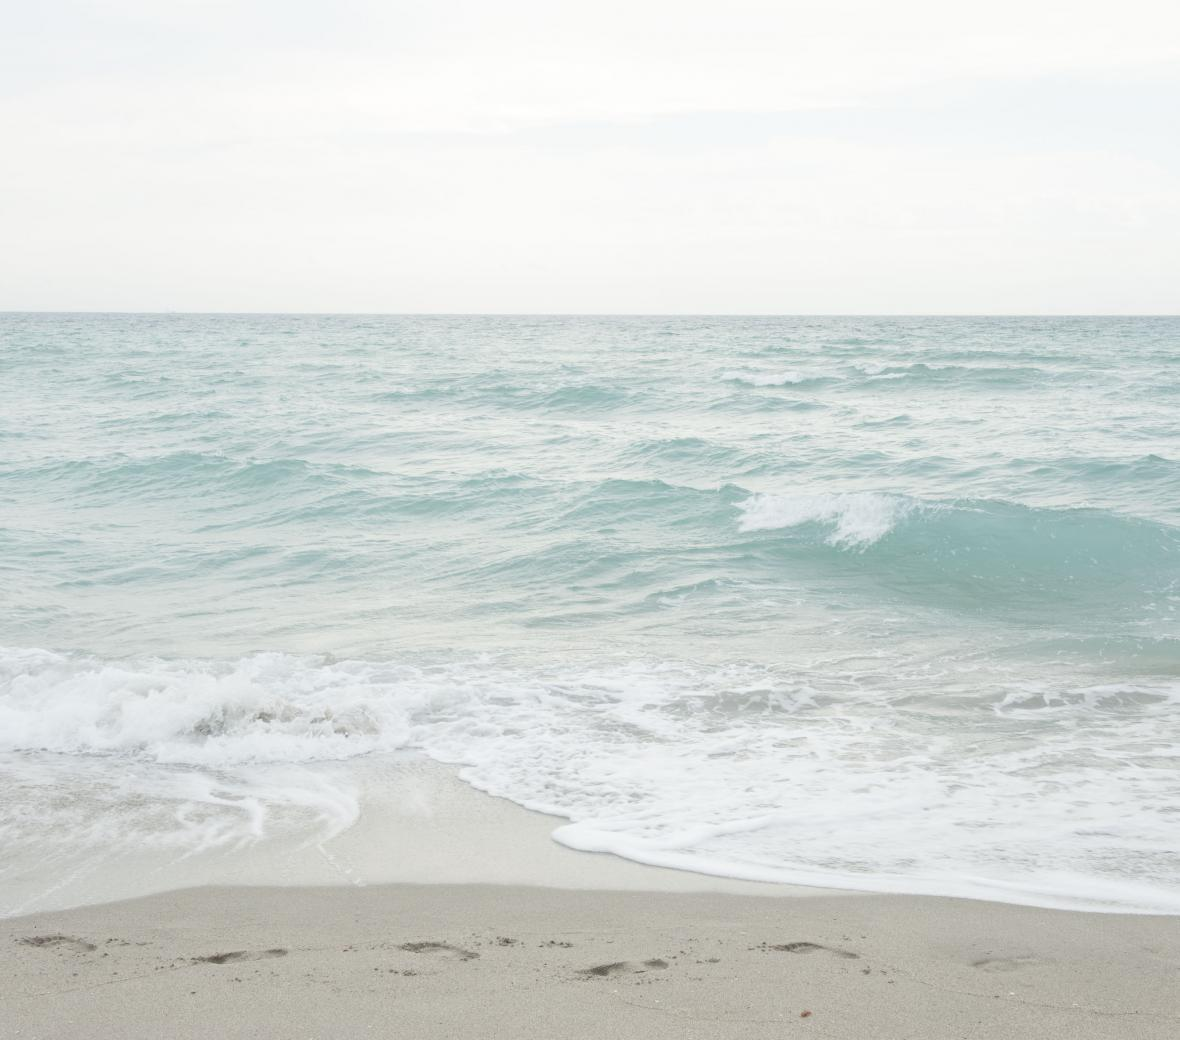 photo of the ocean